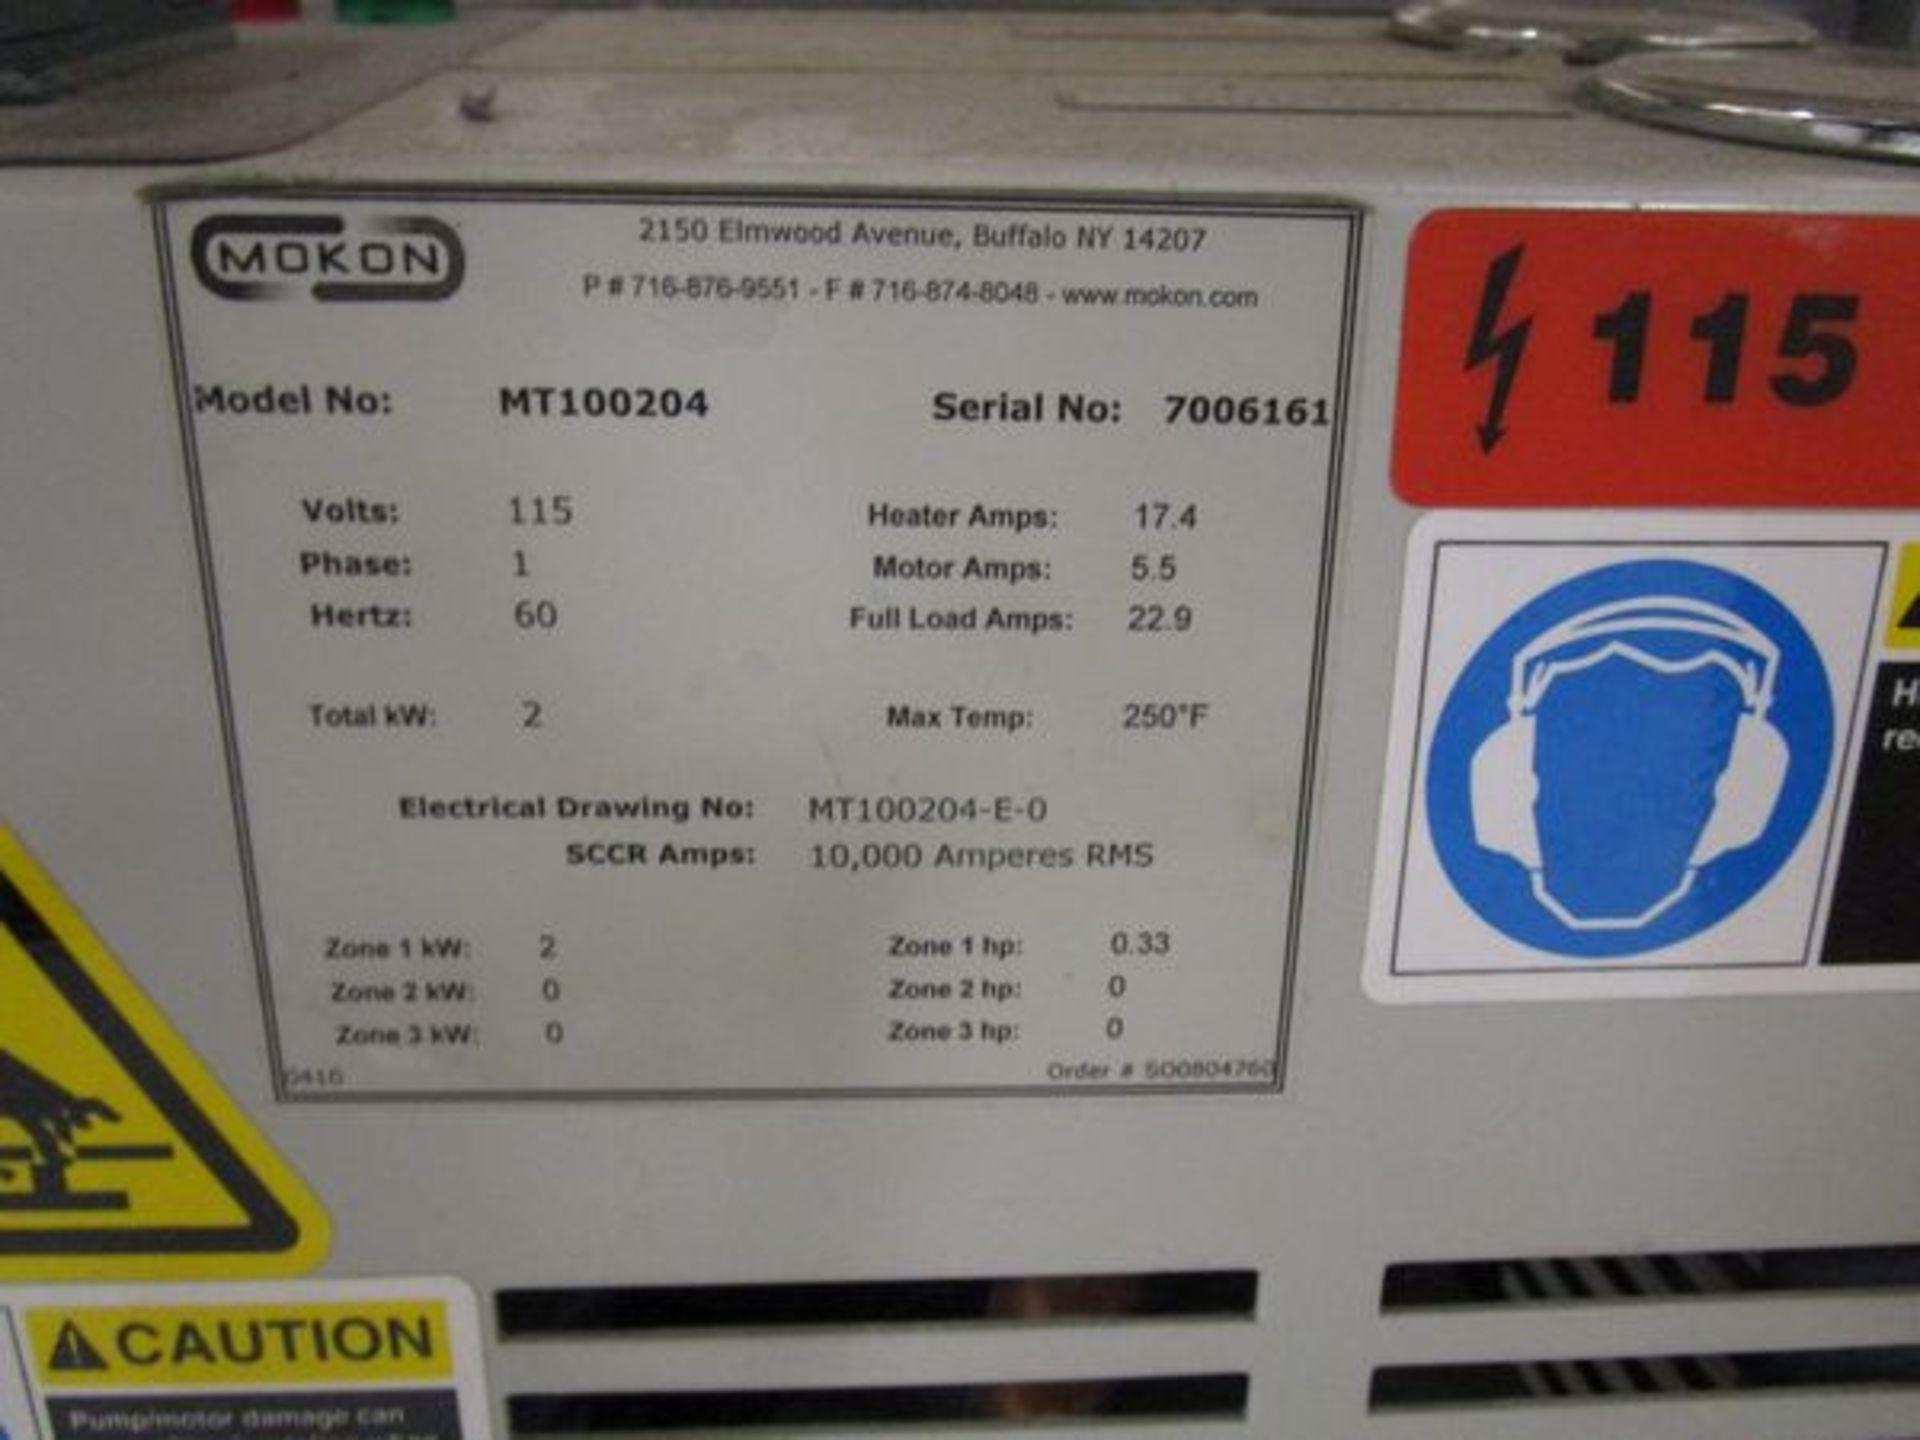 Mokon MT100204 Temp controler s/n 7006161 - Image 2 of 2